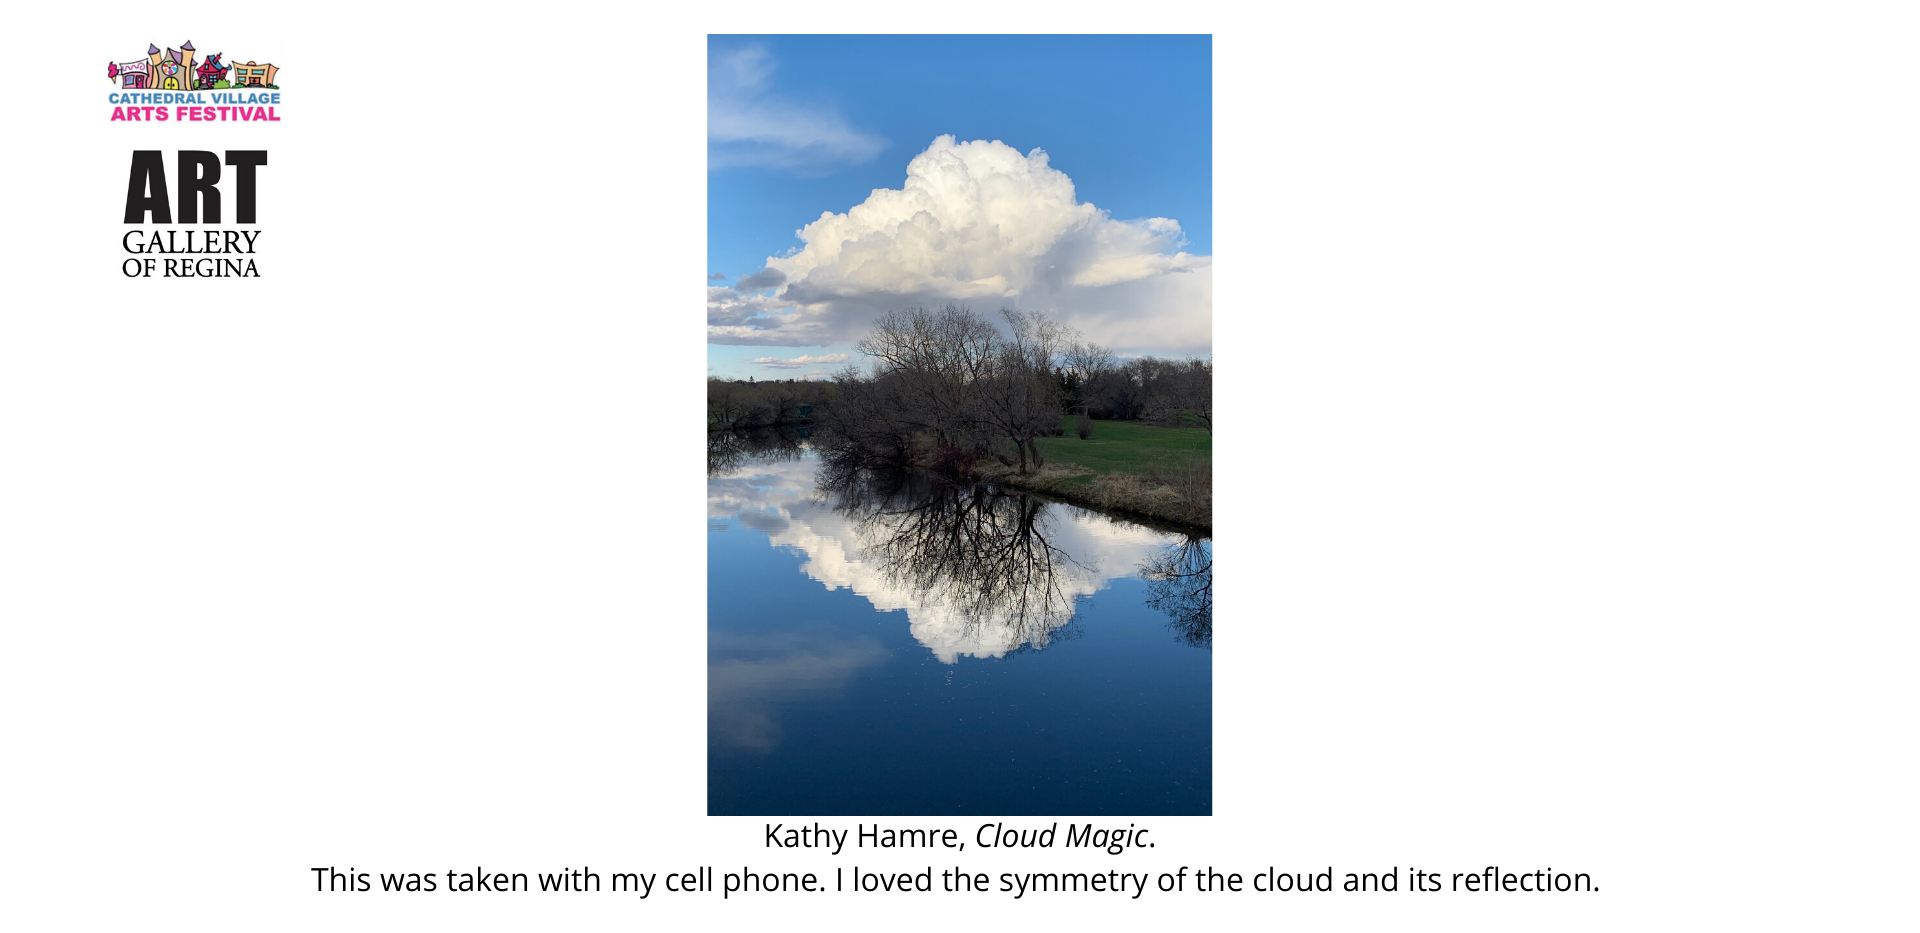 Kathy Hamre, Cloud Magic.